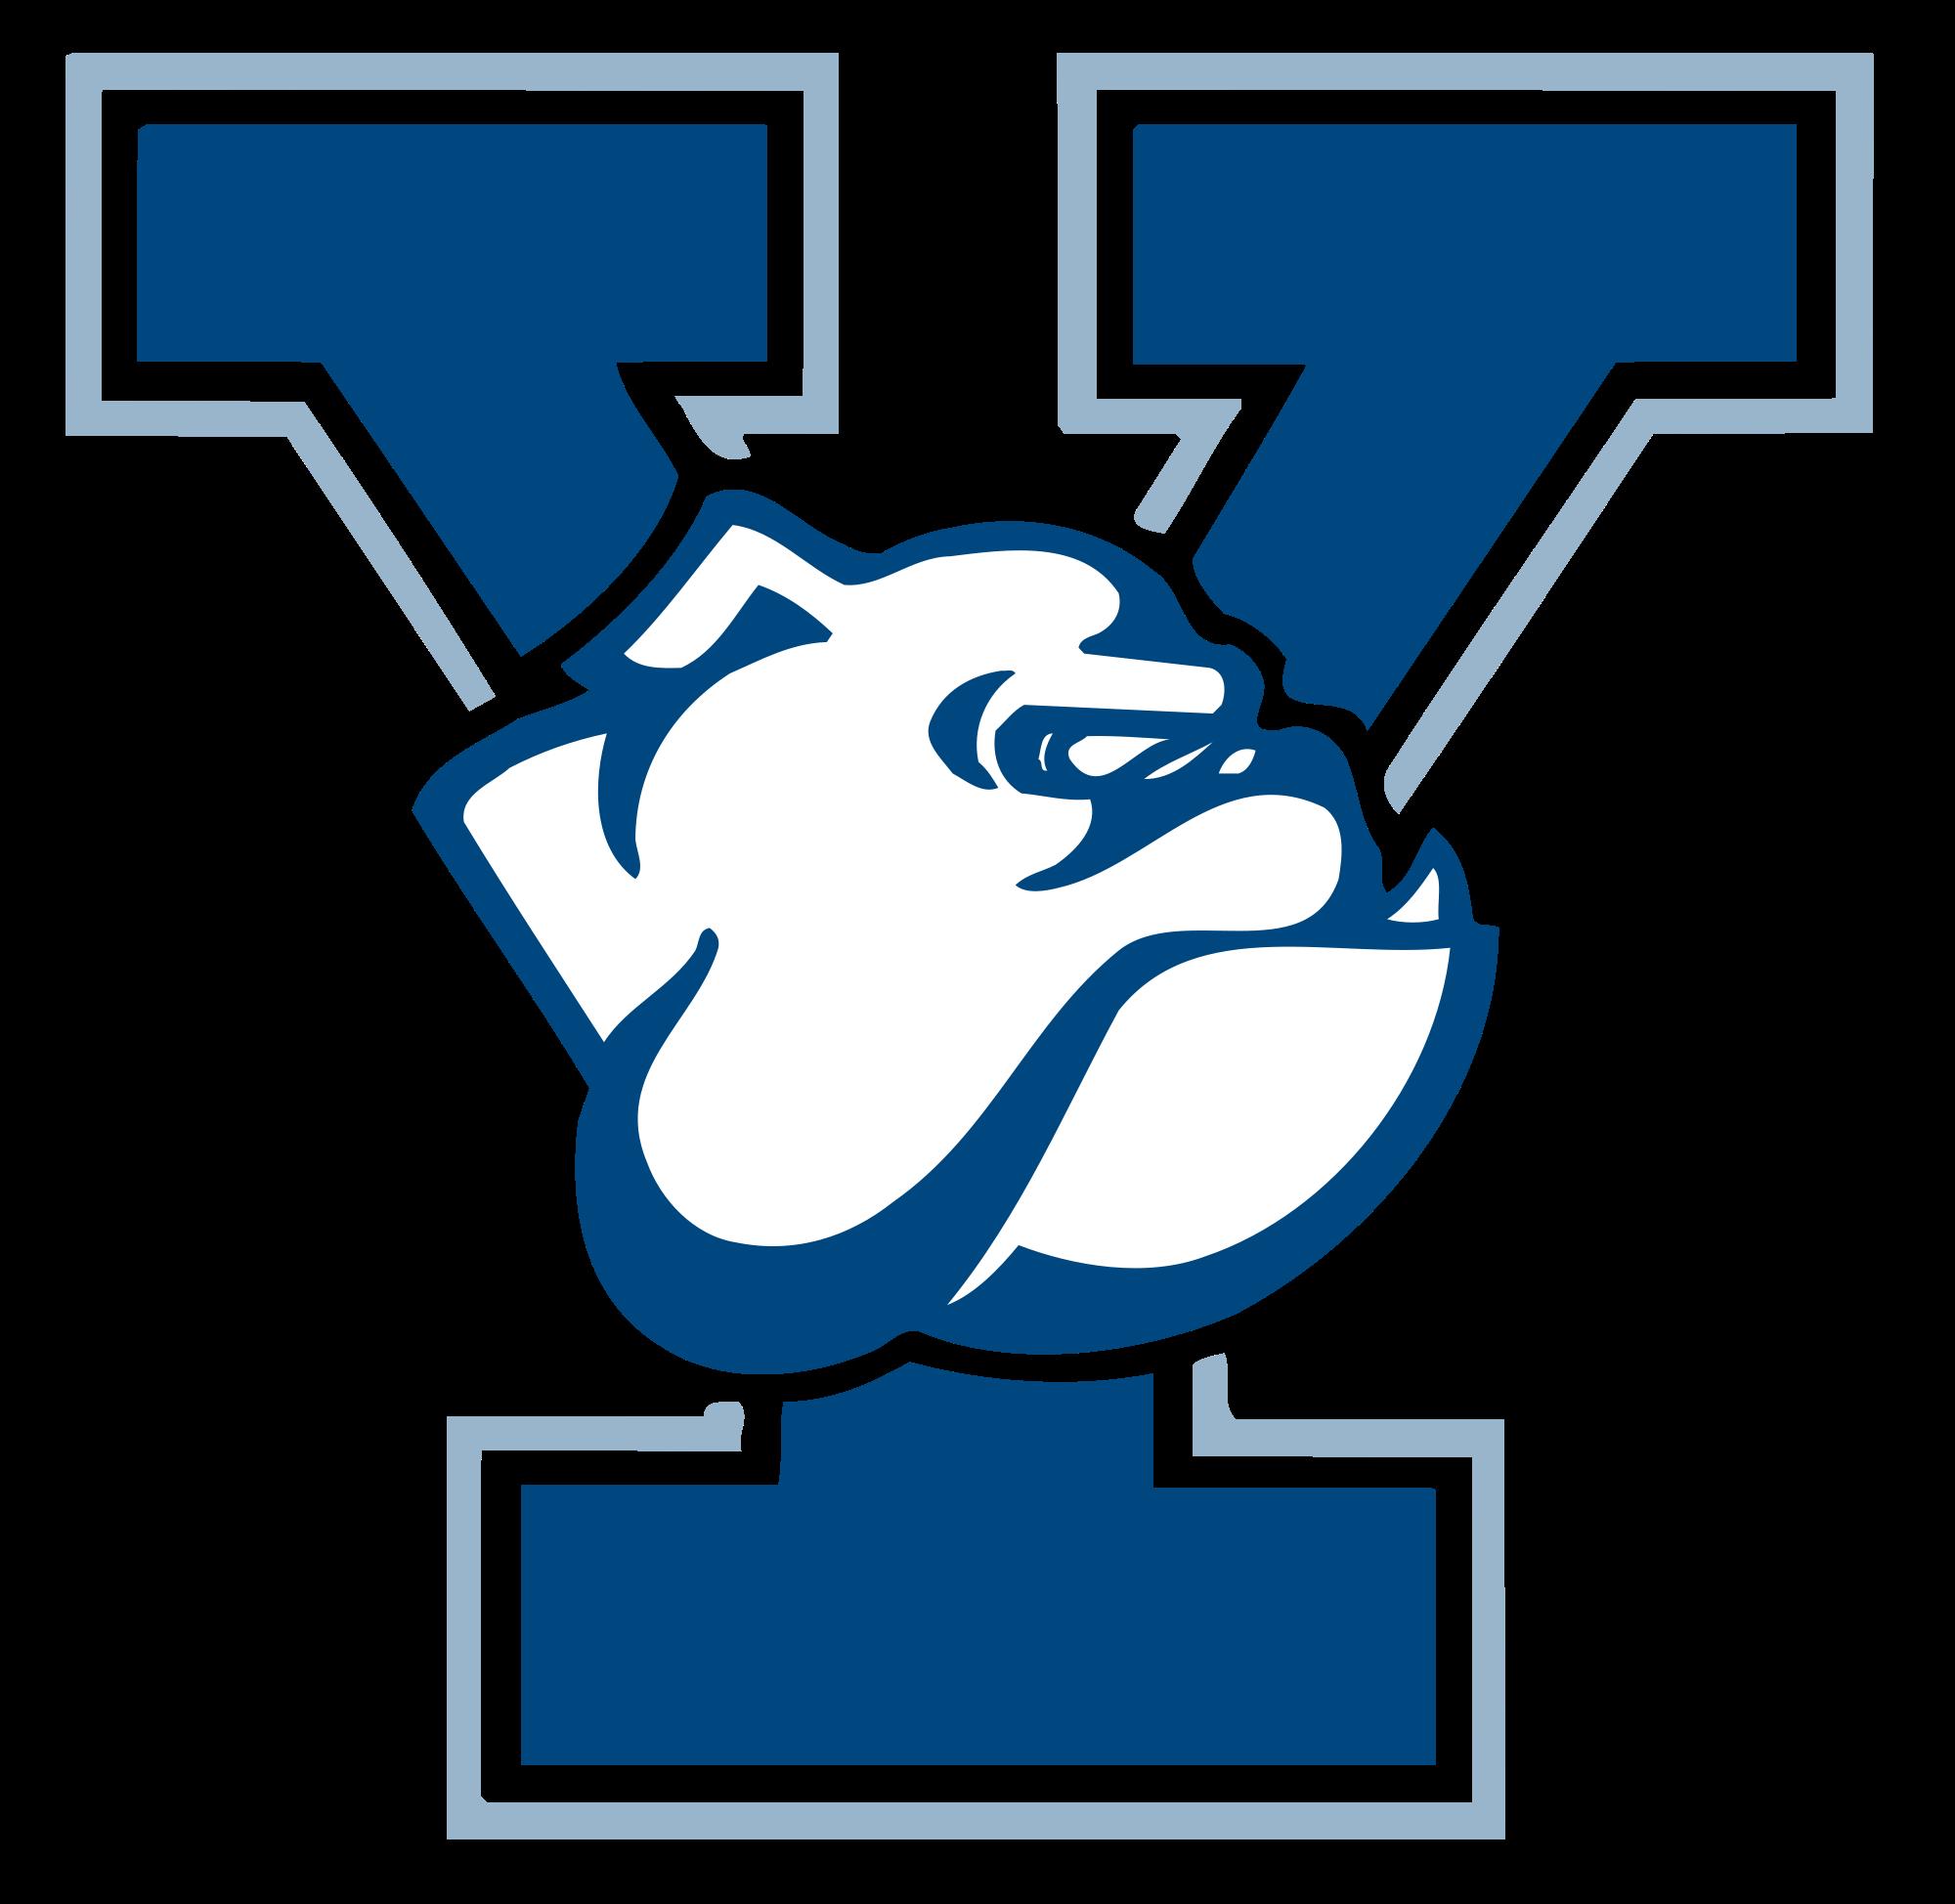 Yale University Logo Google Search Yale University University Logo Yale Bulldogs